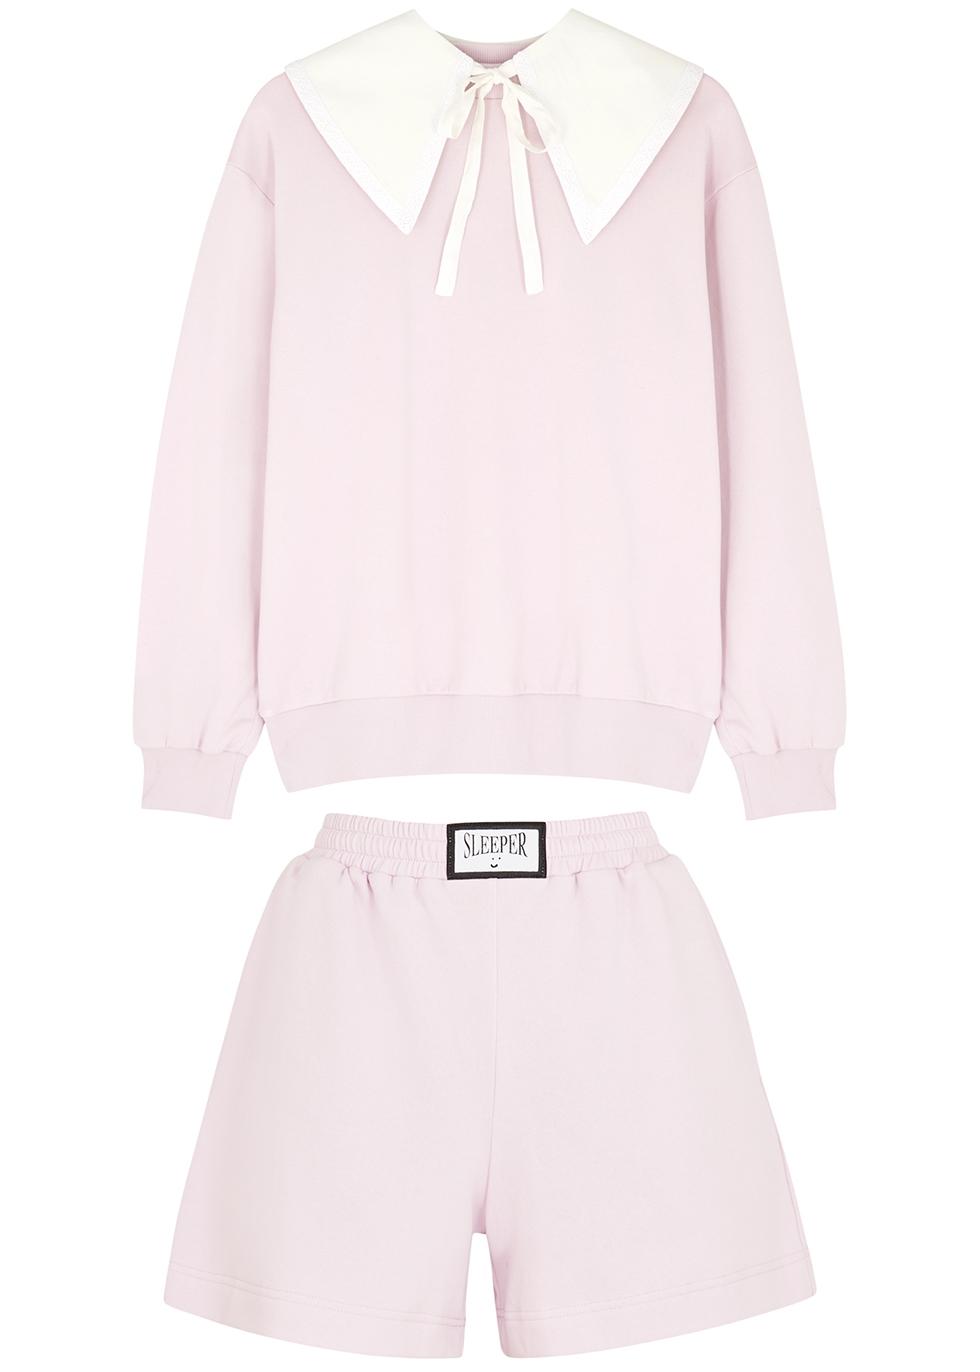 Diana Athpleasure light pink cotton-blend pyjama set